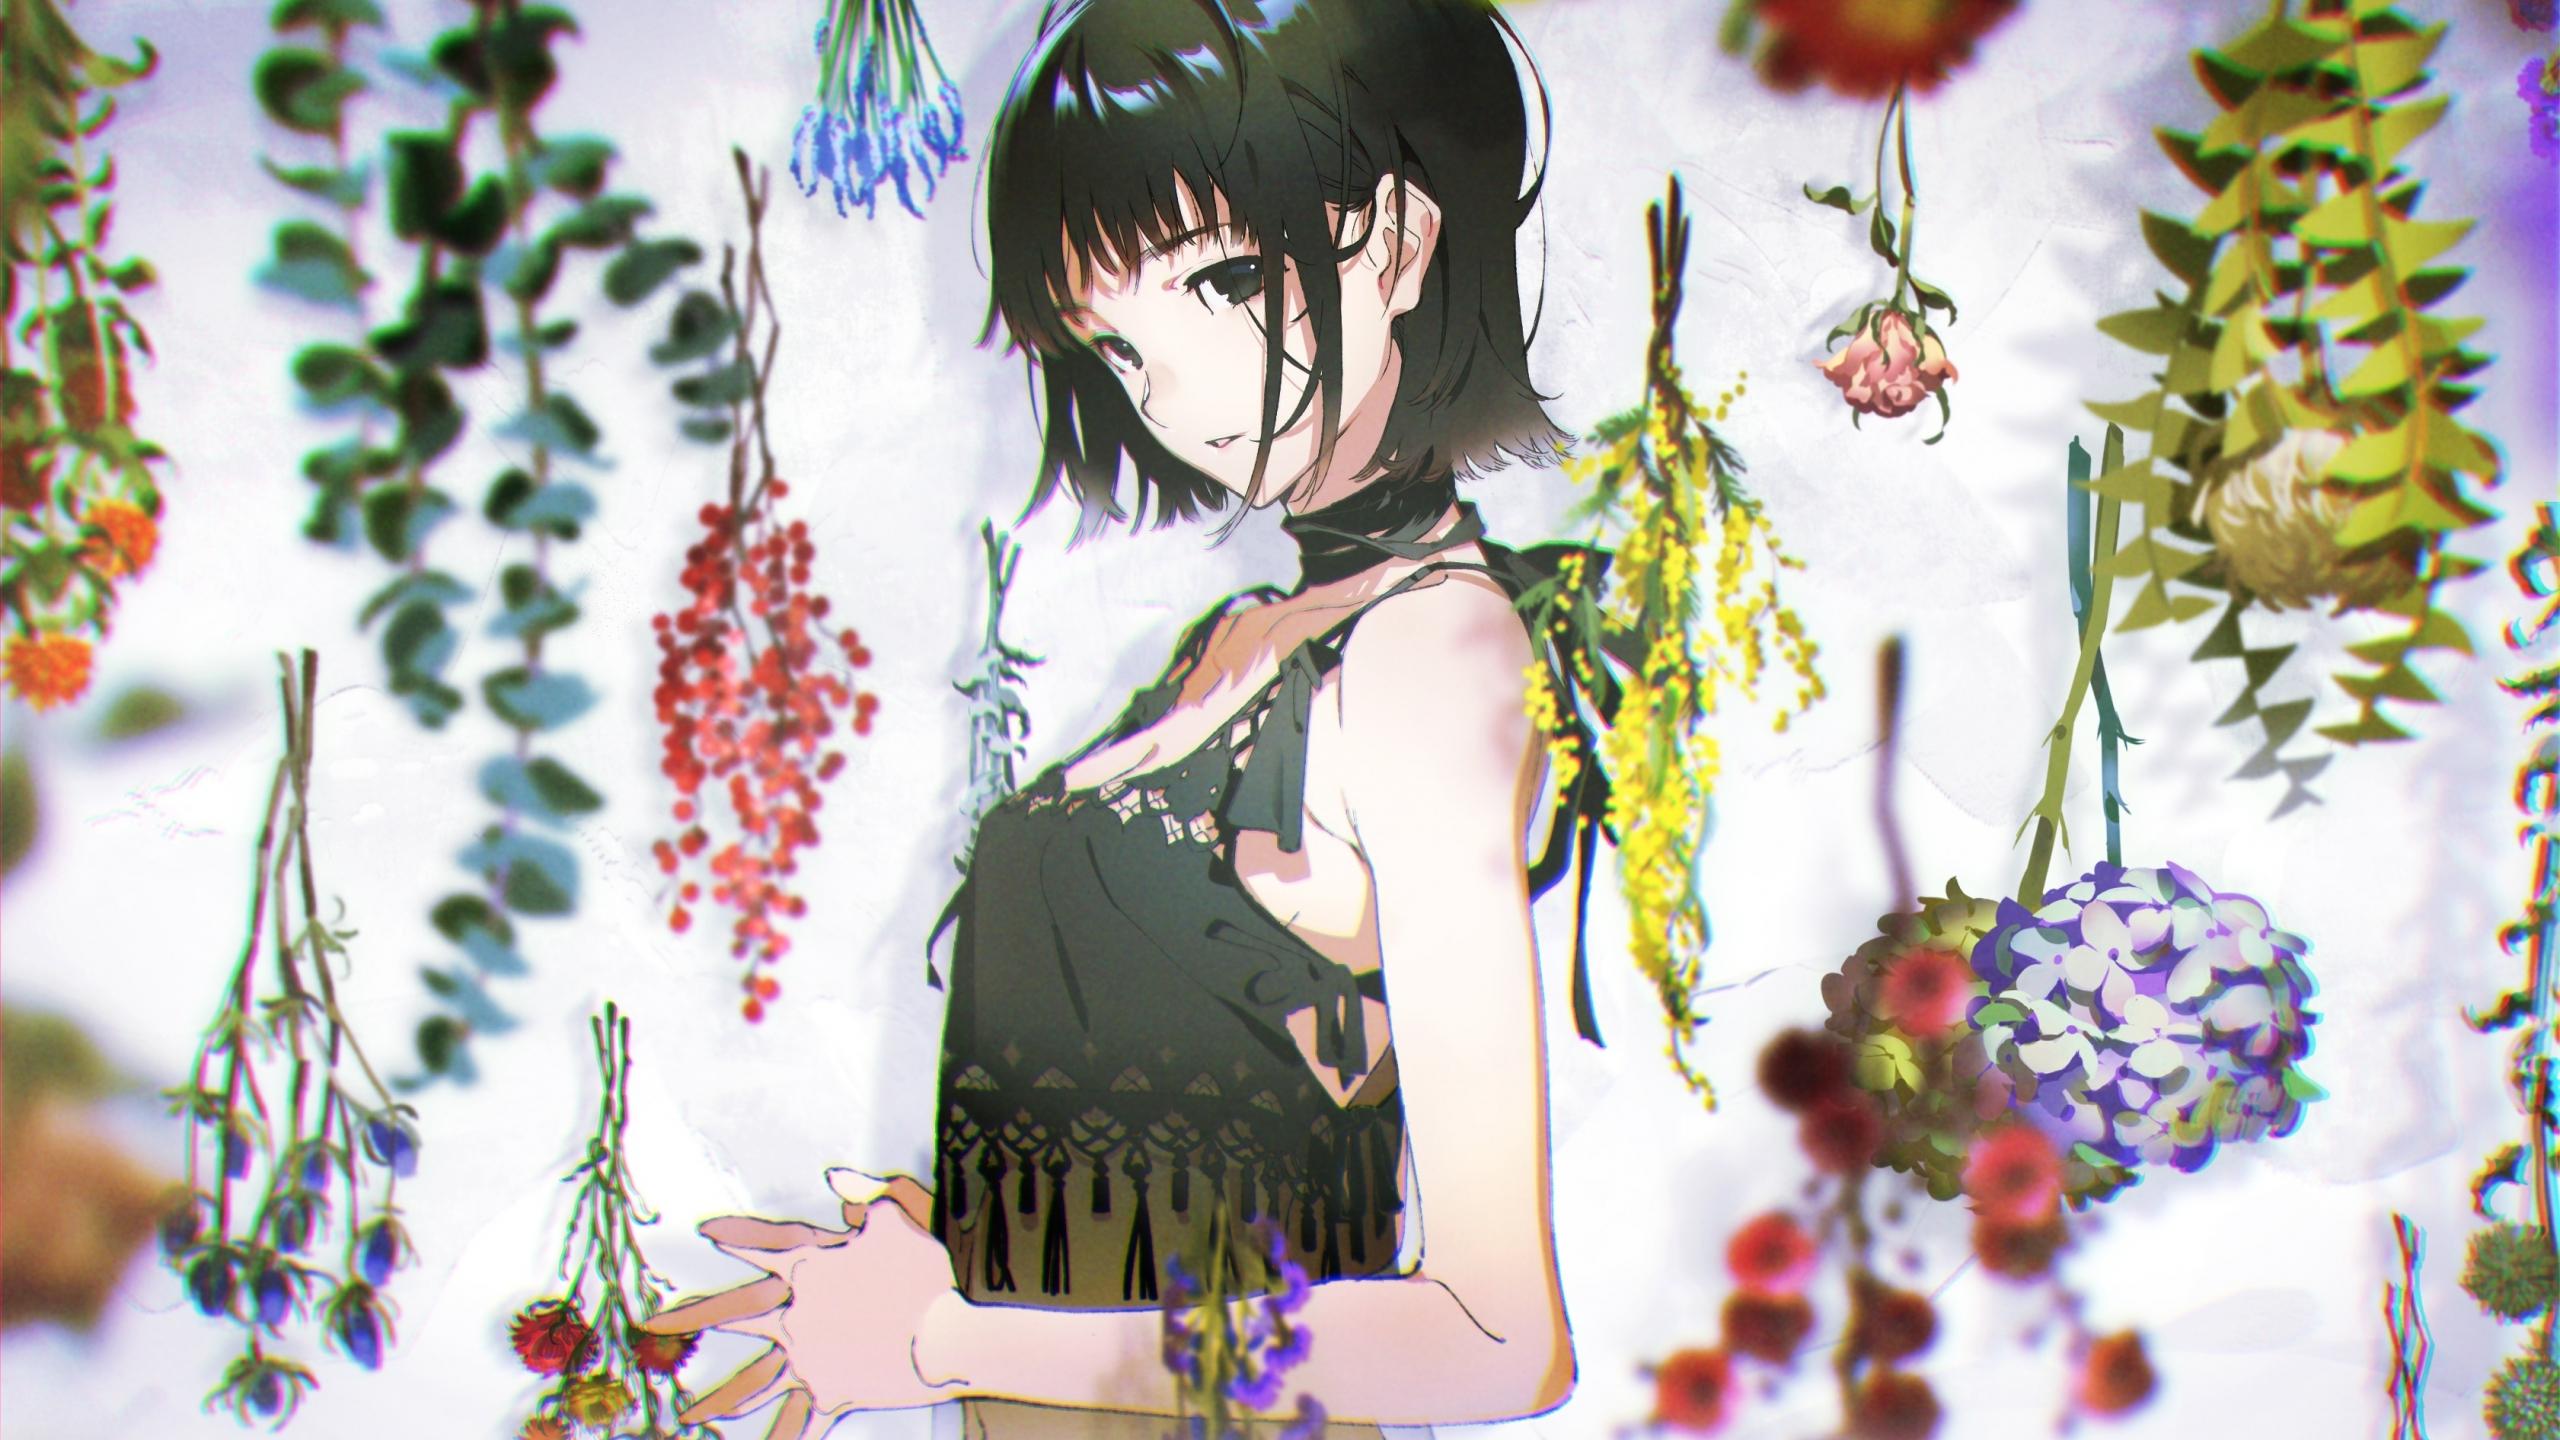 Download 2560x1440 Wallpaper Dark Hair Hot Anime Girl Original Dual Wide Widescreen 16 9 Widescreen 2560x1440 Hd Image Background 8245